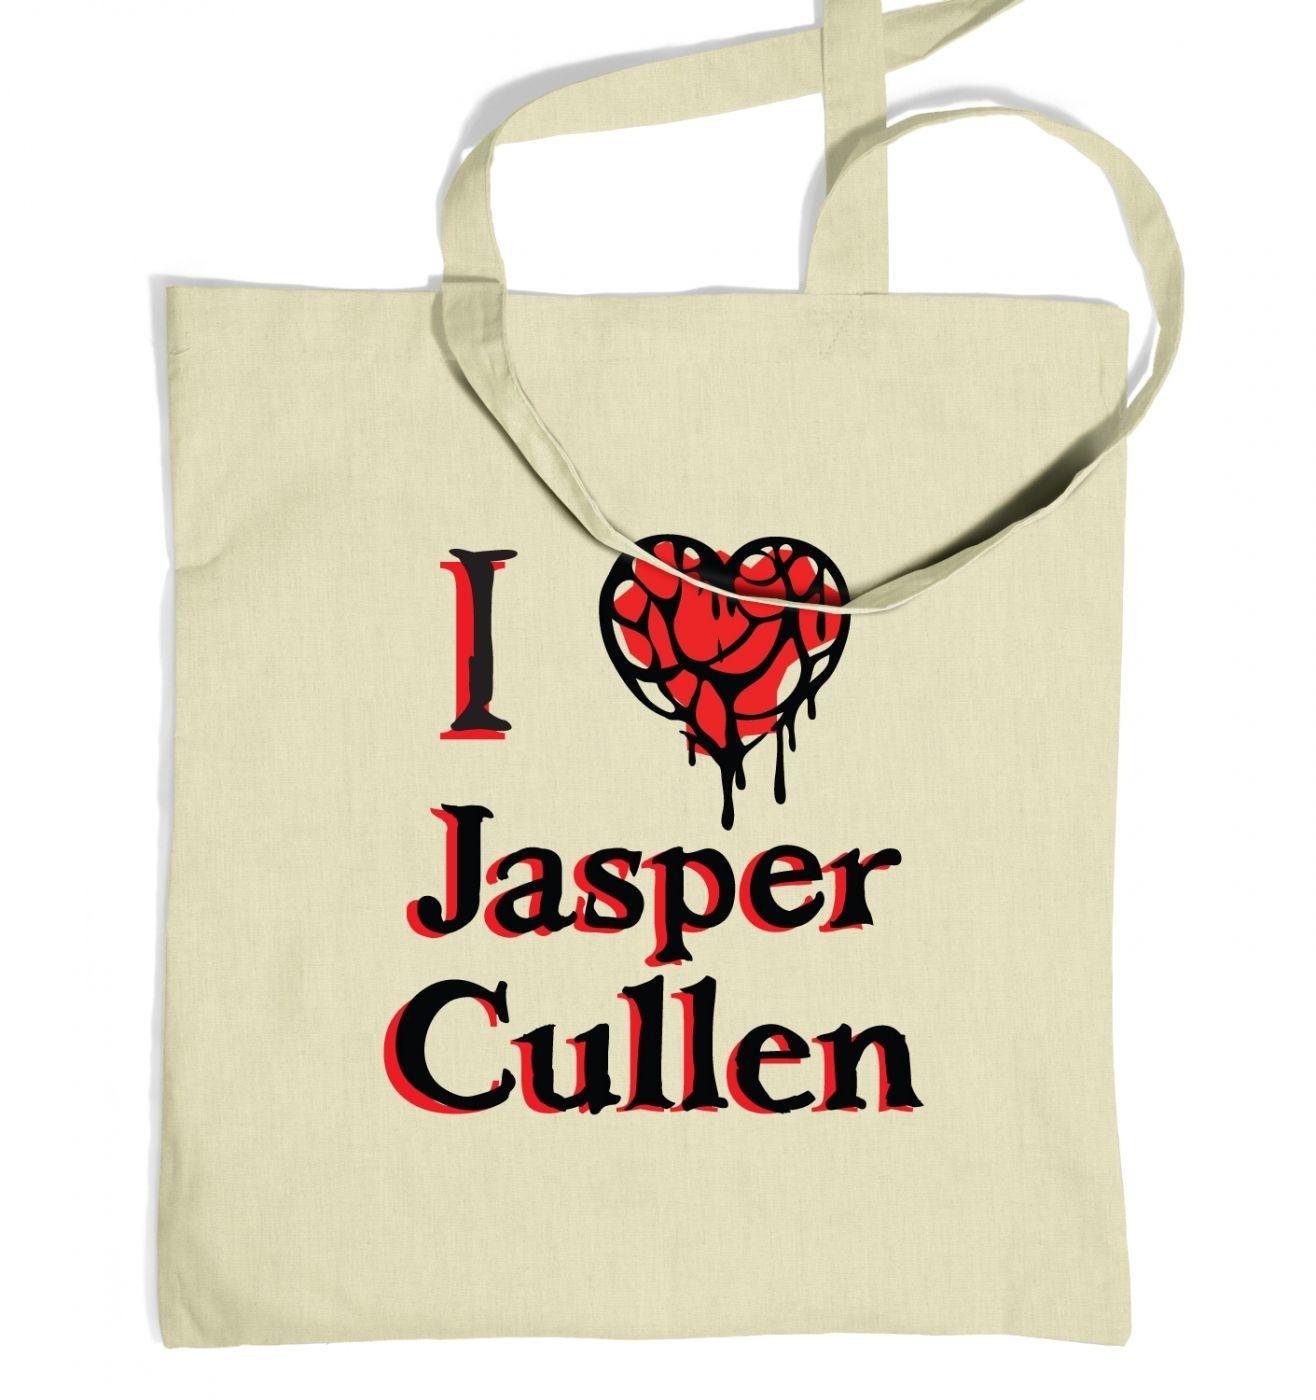 I heart Jasper Cullen tote bag - Inspired by Twilight